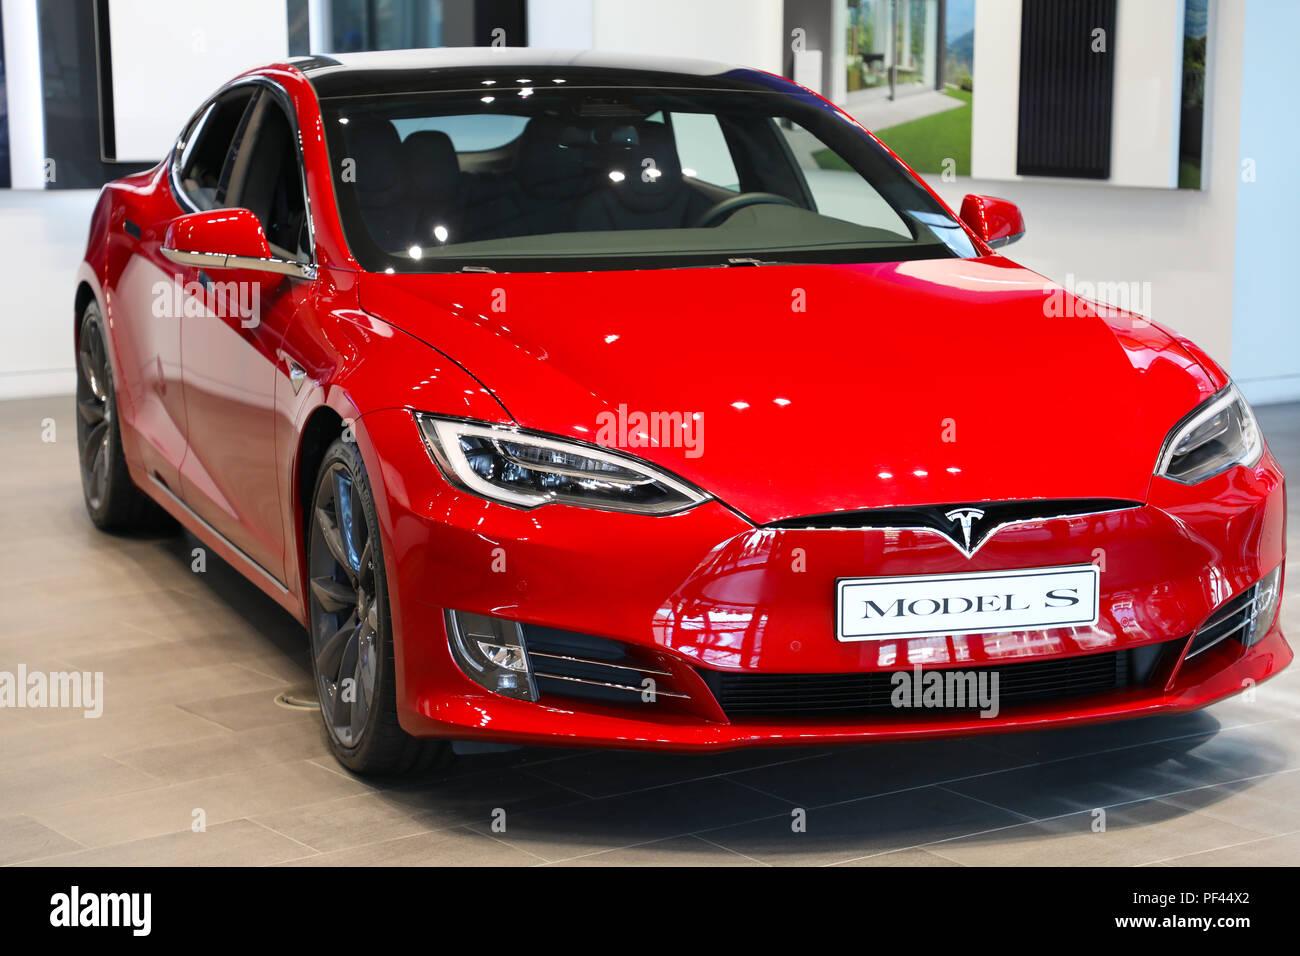 MILAN, ITALY - JULY 30, 2018: Model S car in Tesla showroom, Milan, Italy - Stock Image